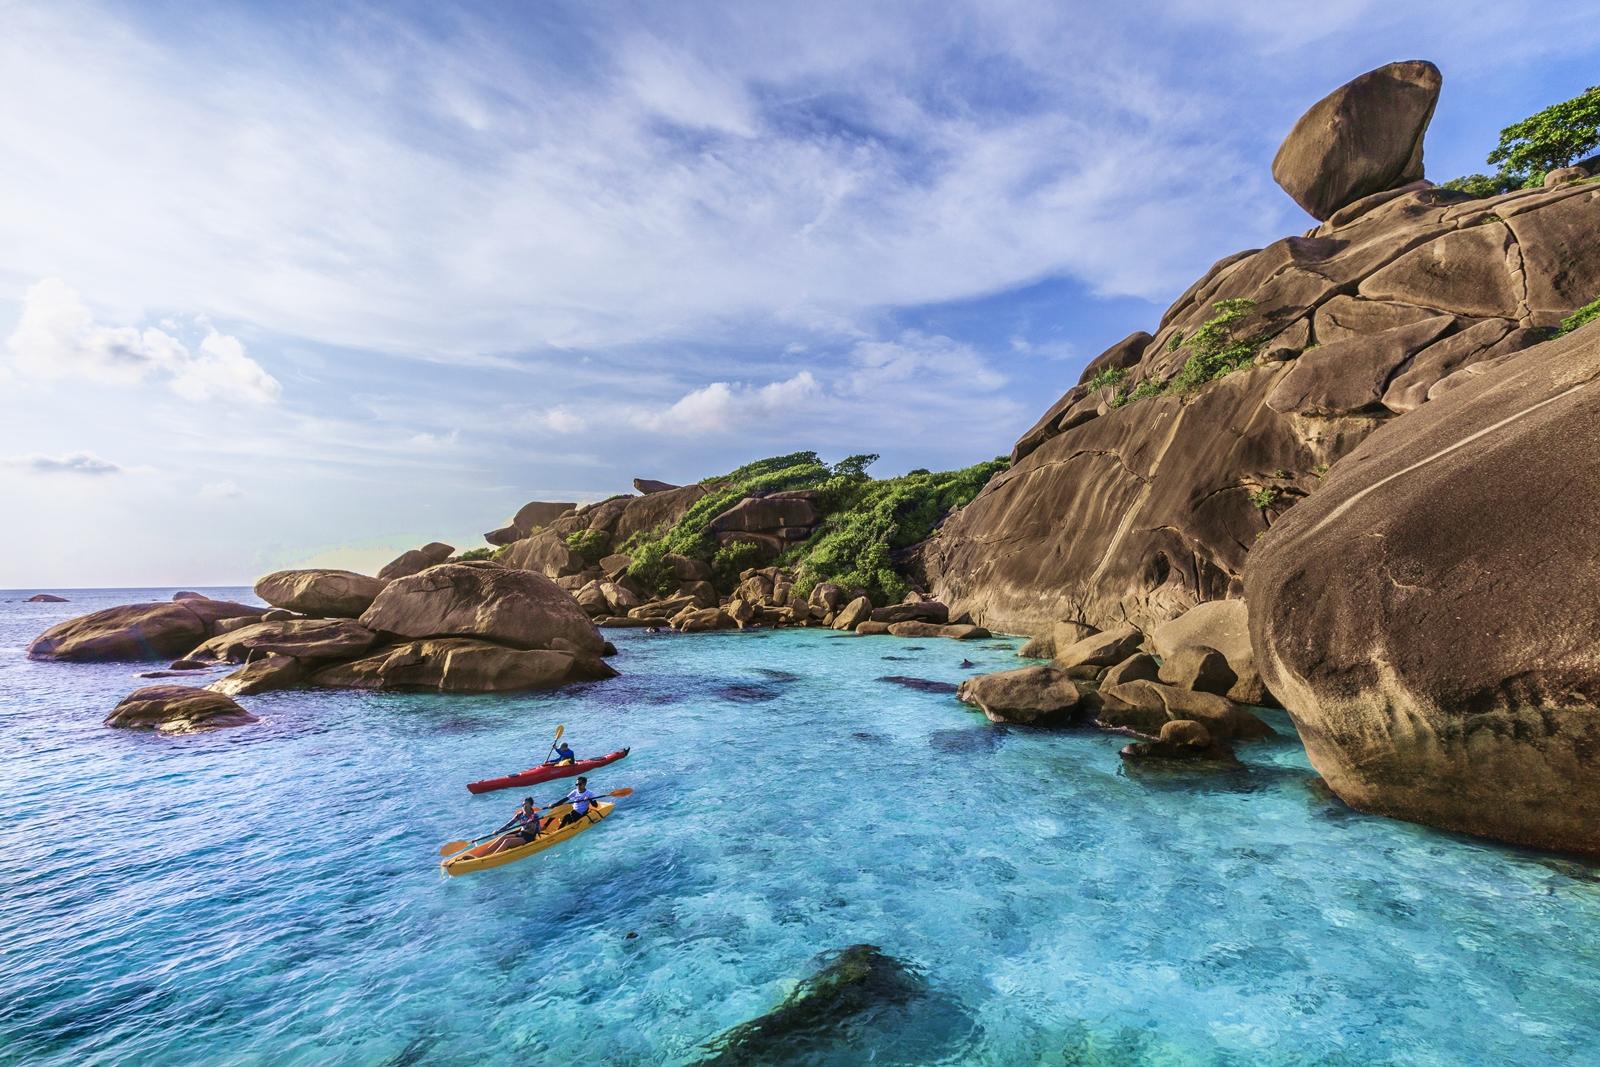 Ko Pad (The Eighth Island) of Mu Ko Similan National Marine Park, Phang-Nga